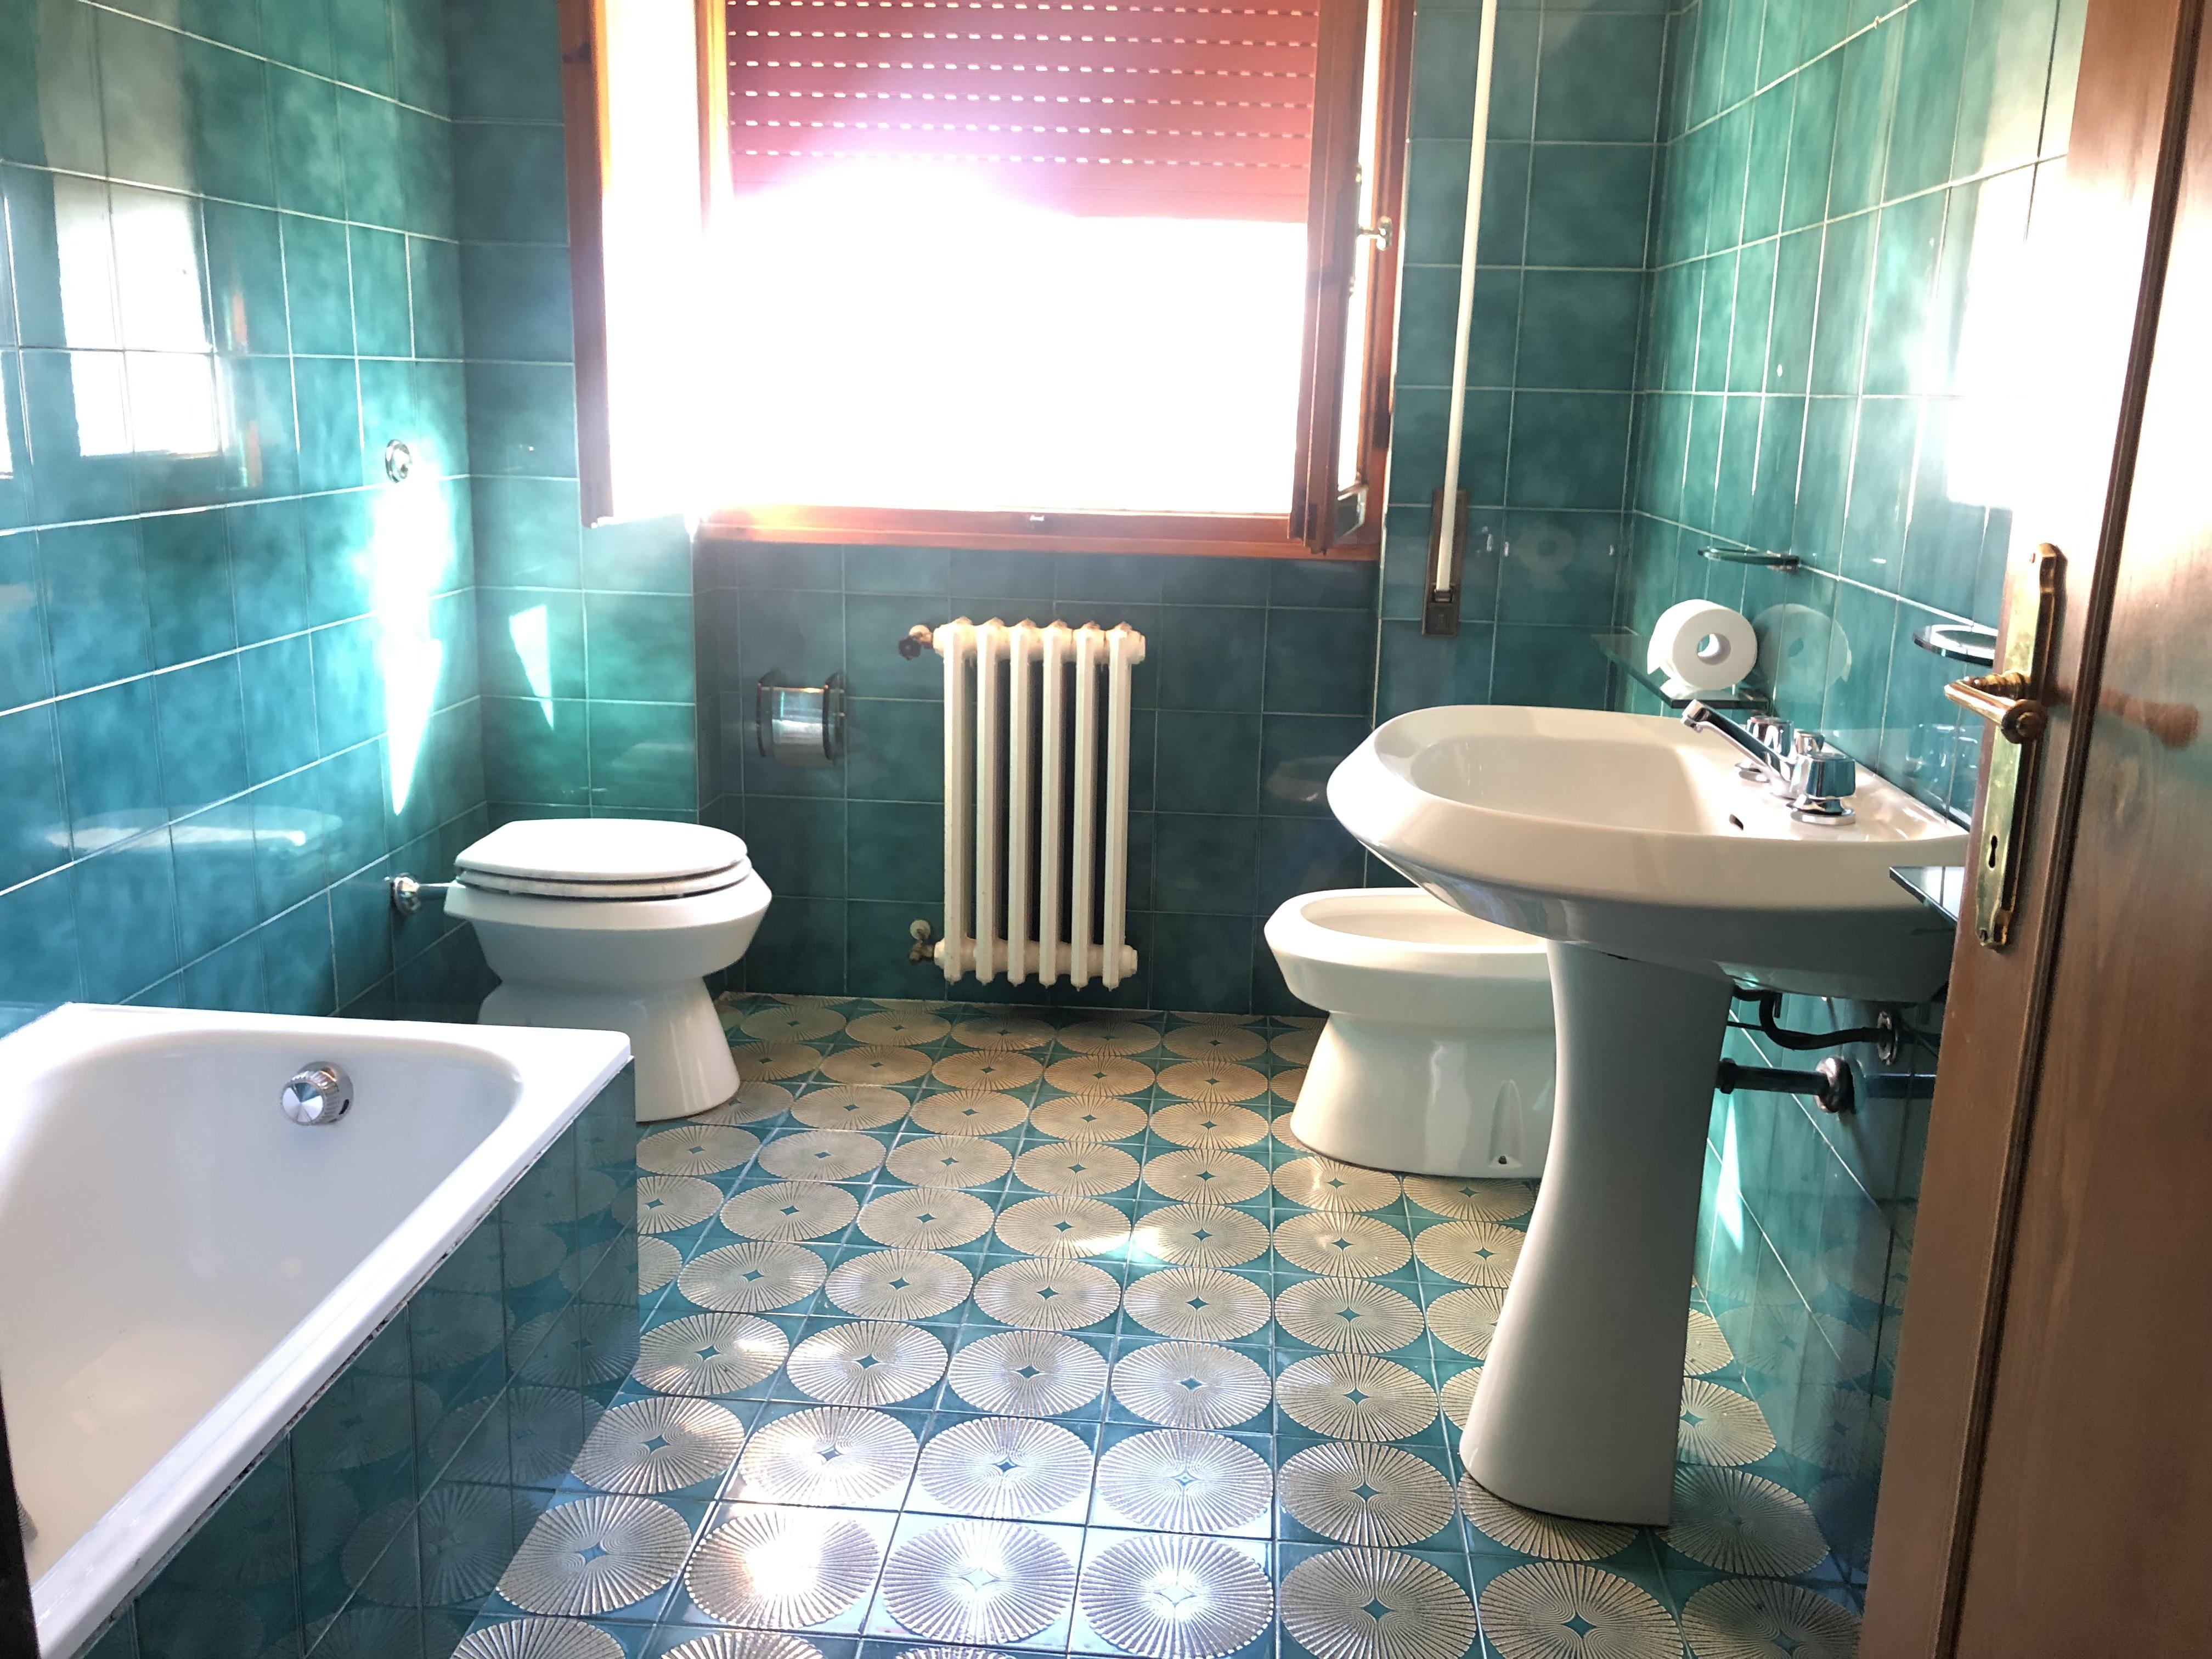 ZONA SANT' ALESSIO,PISTOIA,51100,2 Bedrooms Bedrooms,1 BagnoBathrooms,Appartamento,ZONA SANT' ALESSIO,1493